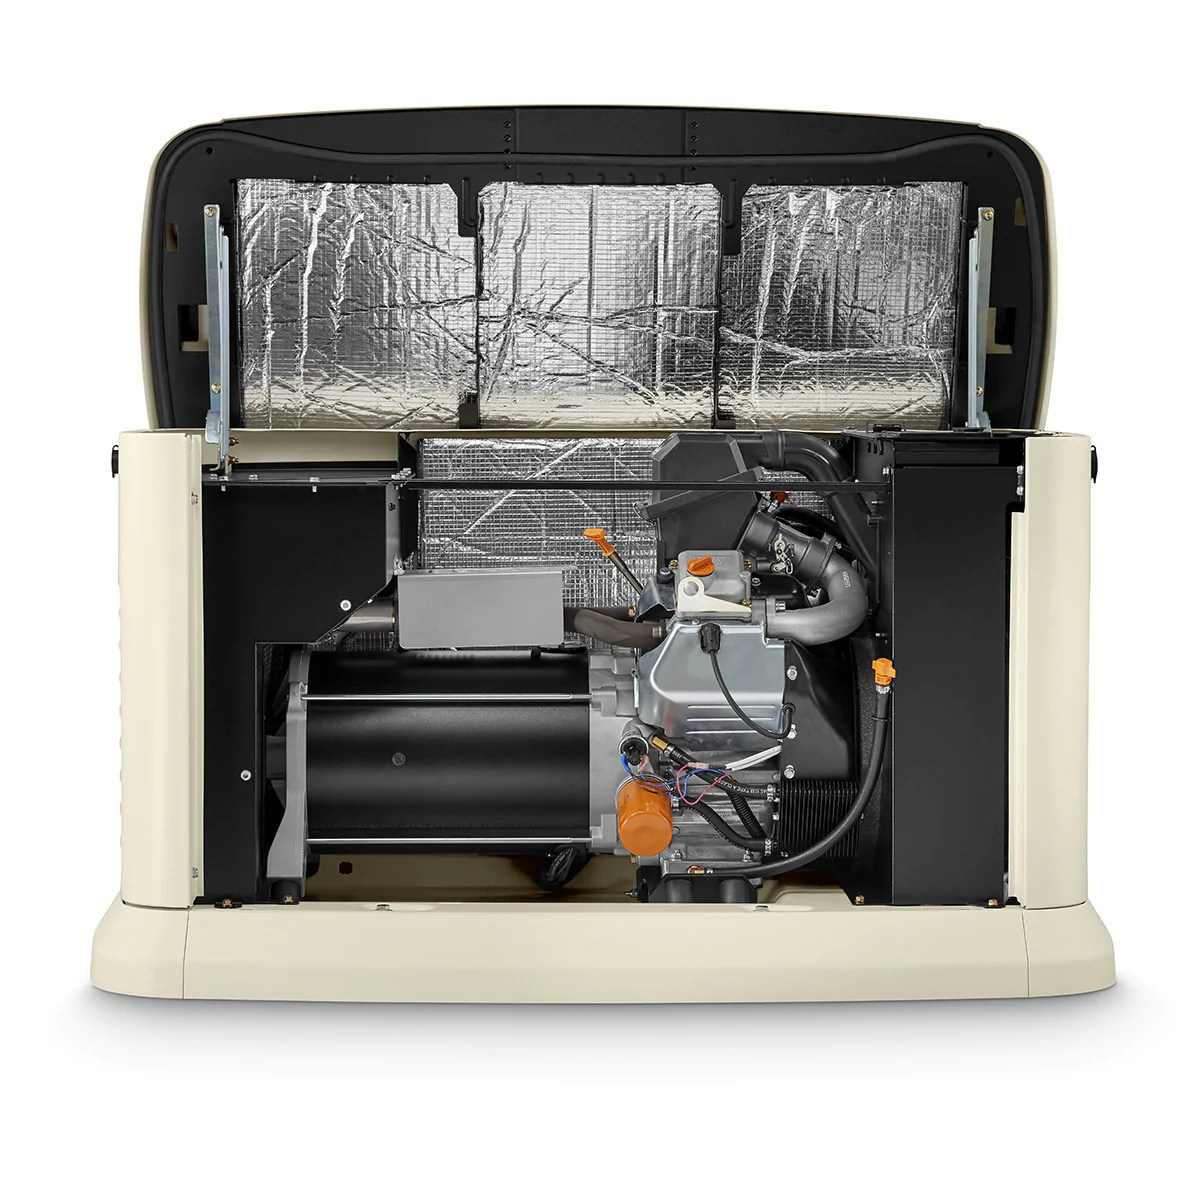 generac guardian 70331 11kw aluminum automatic standby generator fantastic vent wiring schematic 11kw generac wiring schematic [ 1200 x 1200 Pixel ]